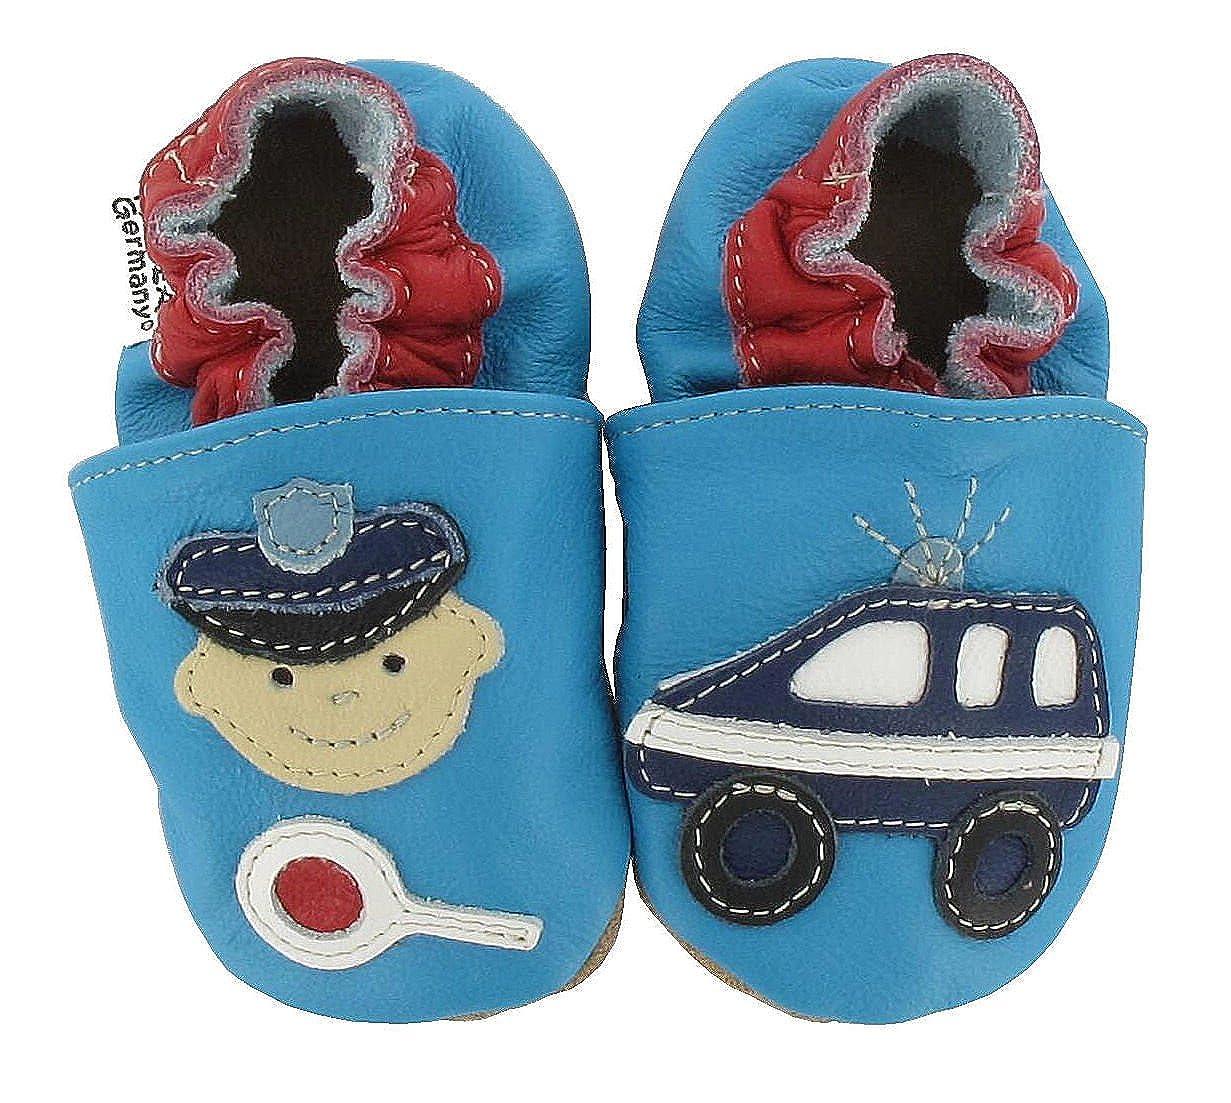 HOBEA-Germany Unisex Baby Police Krabbelschuhe